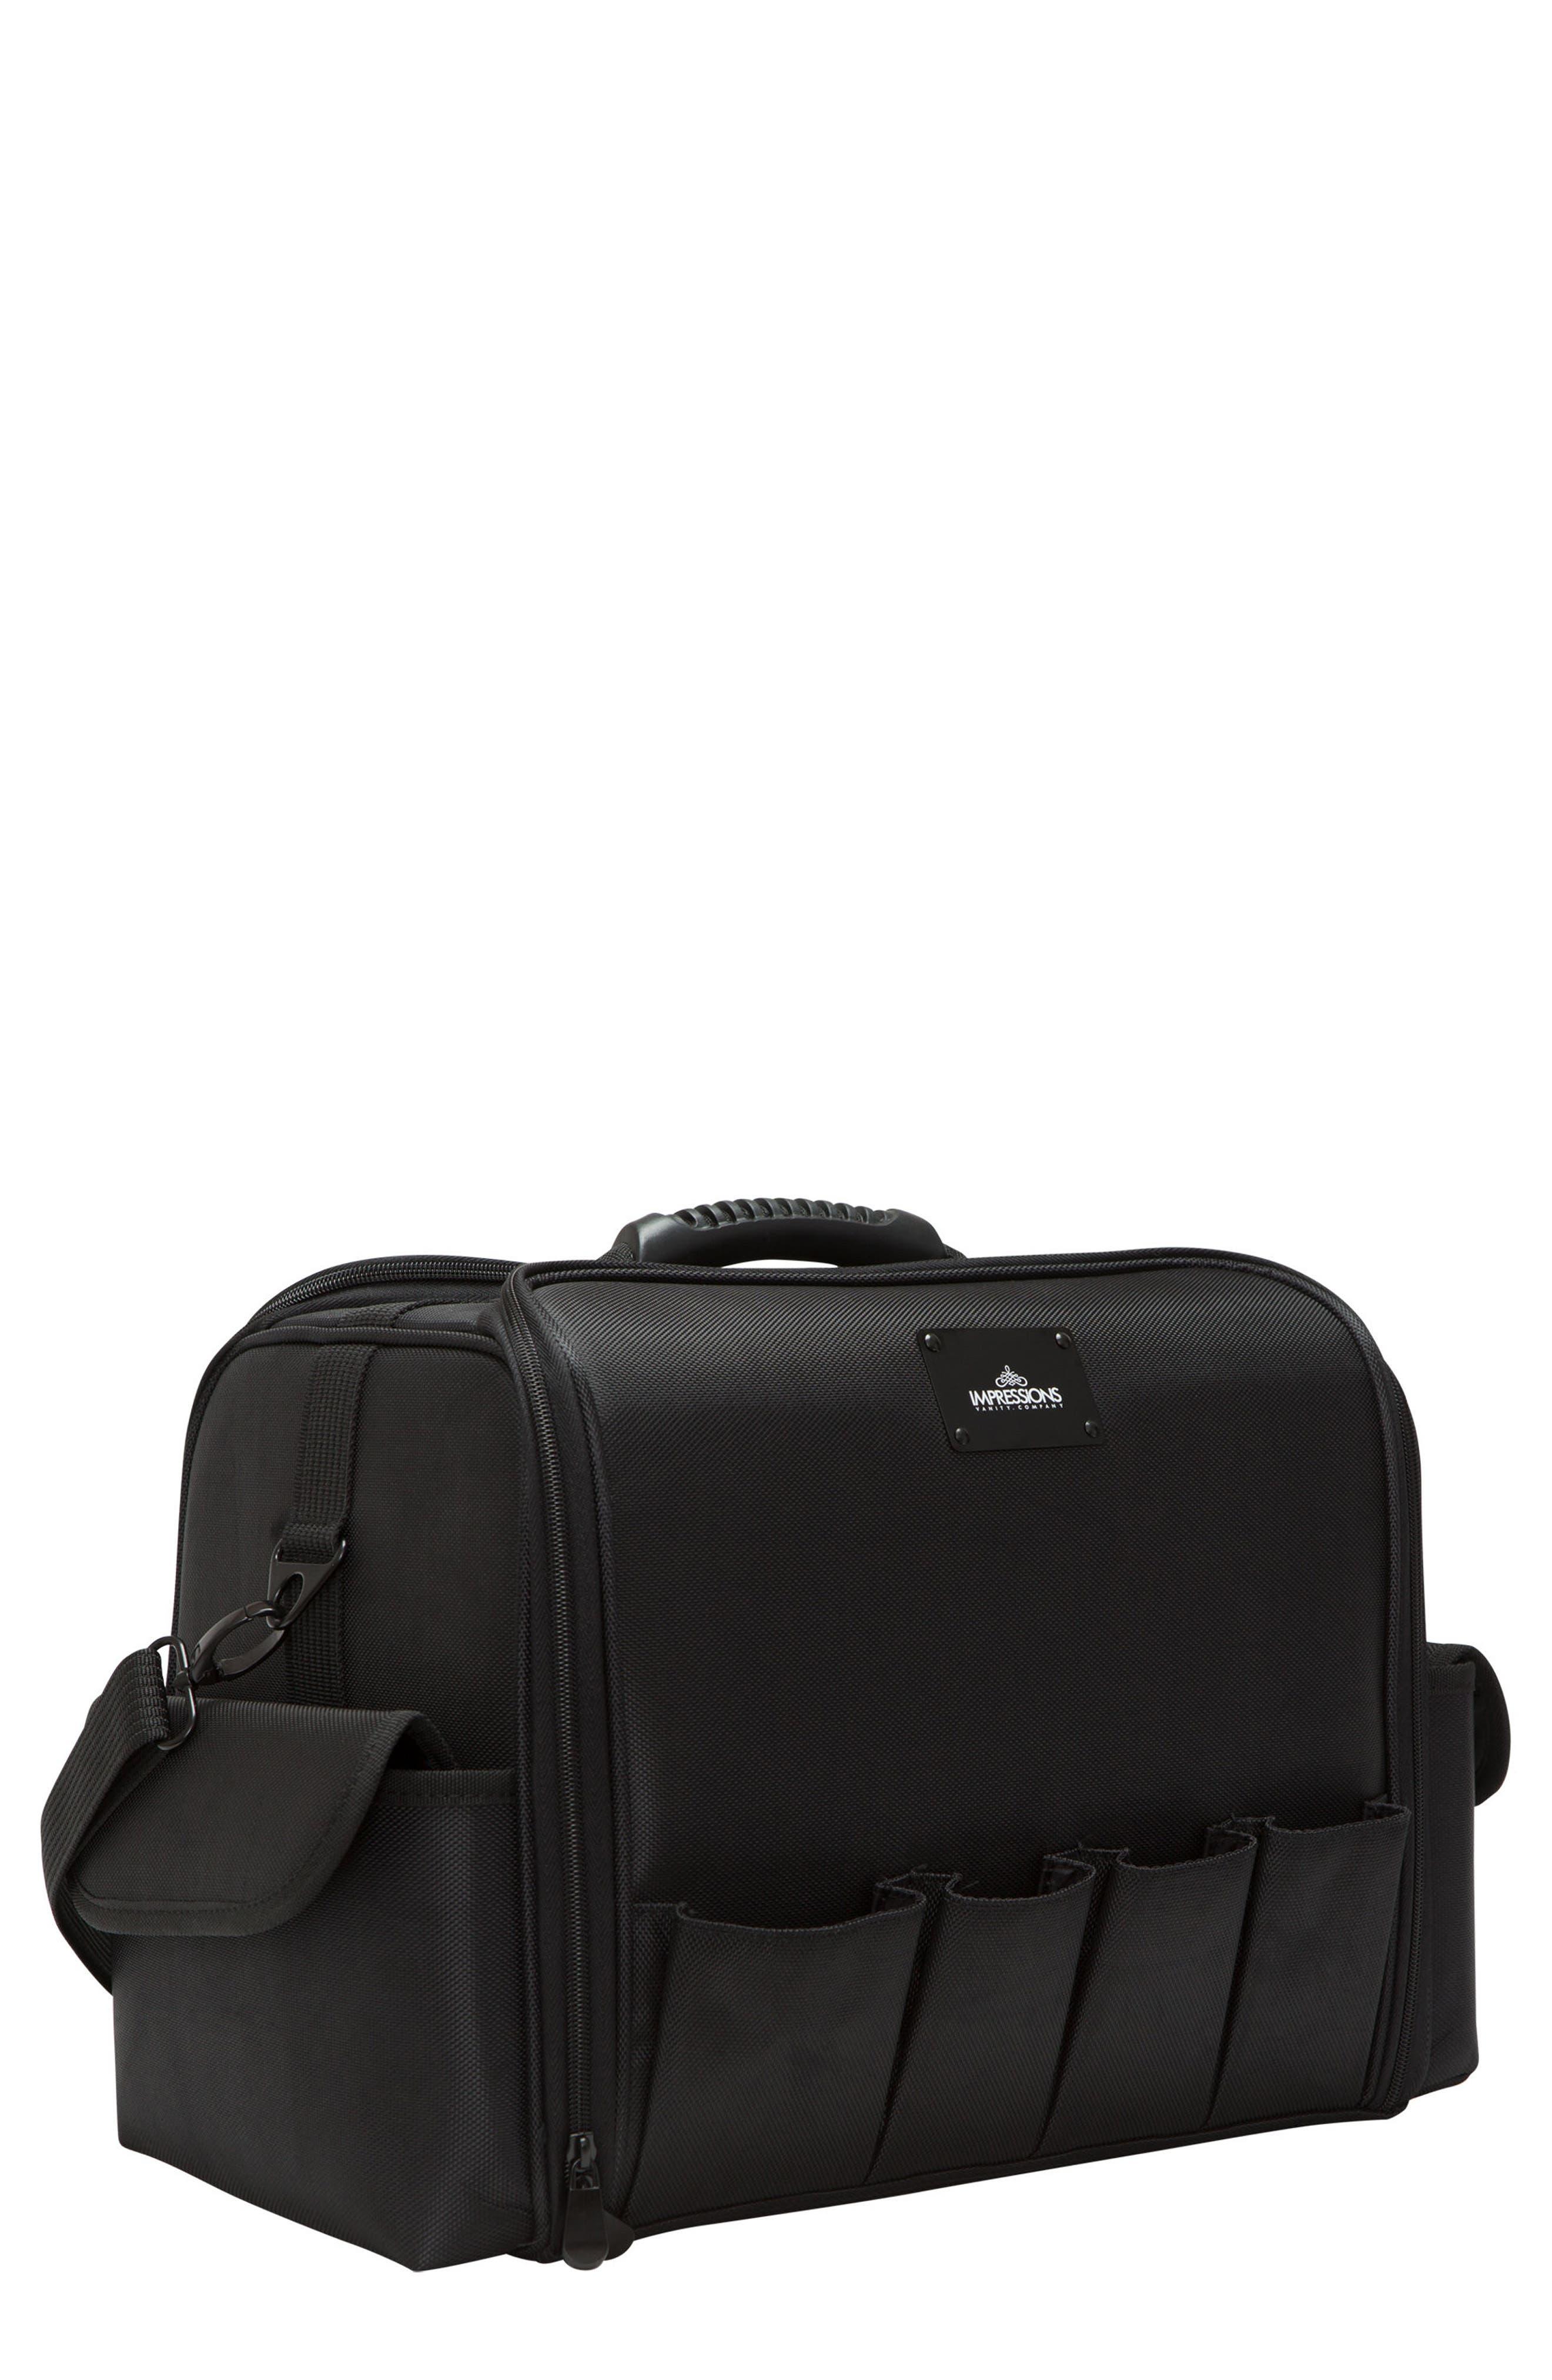 SLAYssentials Pro 12-Inch Case,                             Main thumbnail 1, color,                             BLACK